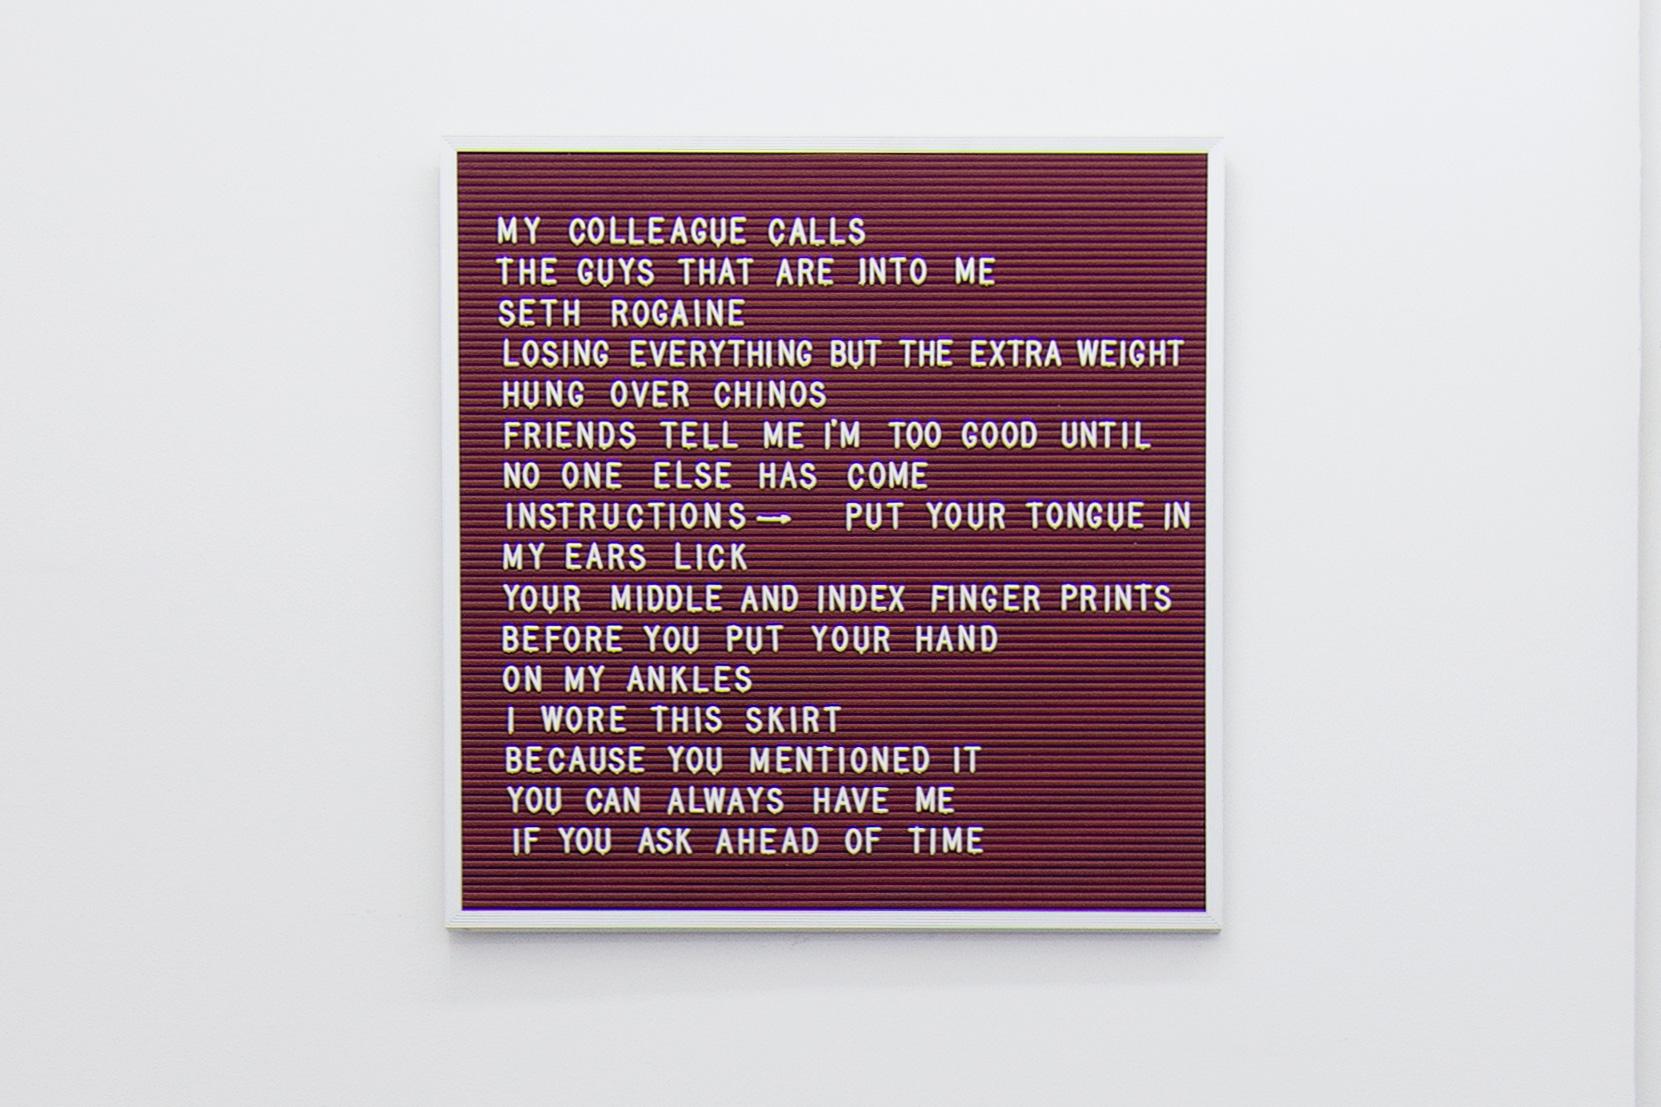 Nicole Reber Seth Rogaine, 2014 Plastic on vinyl letterboard